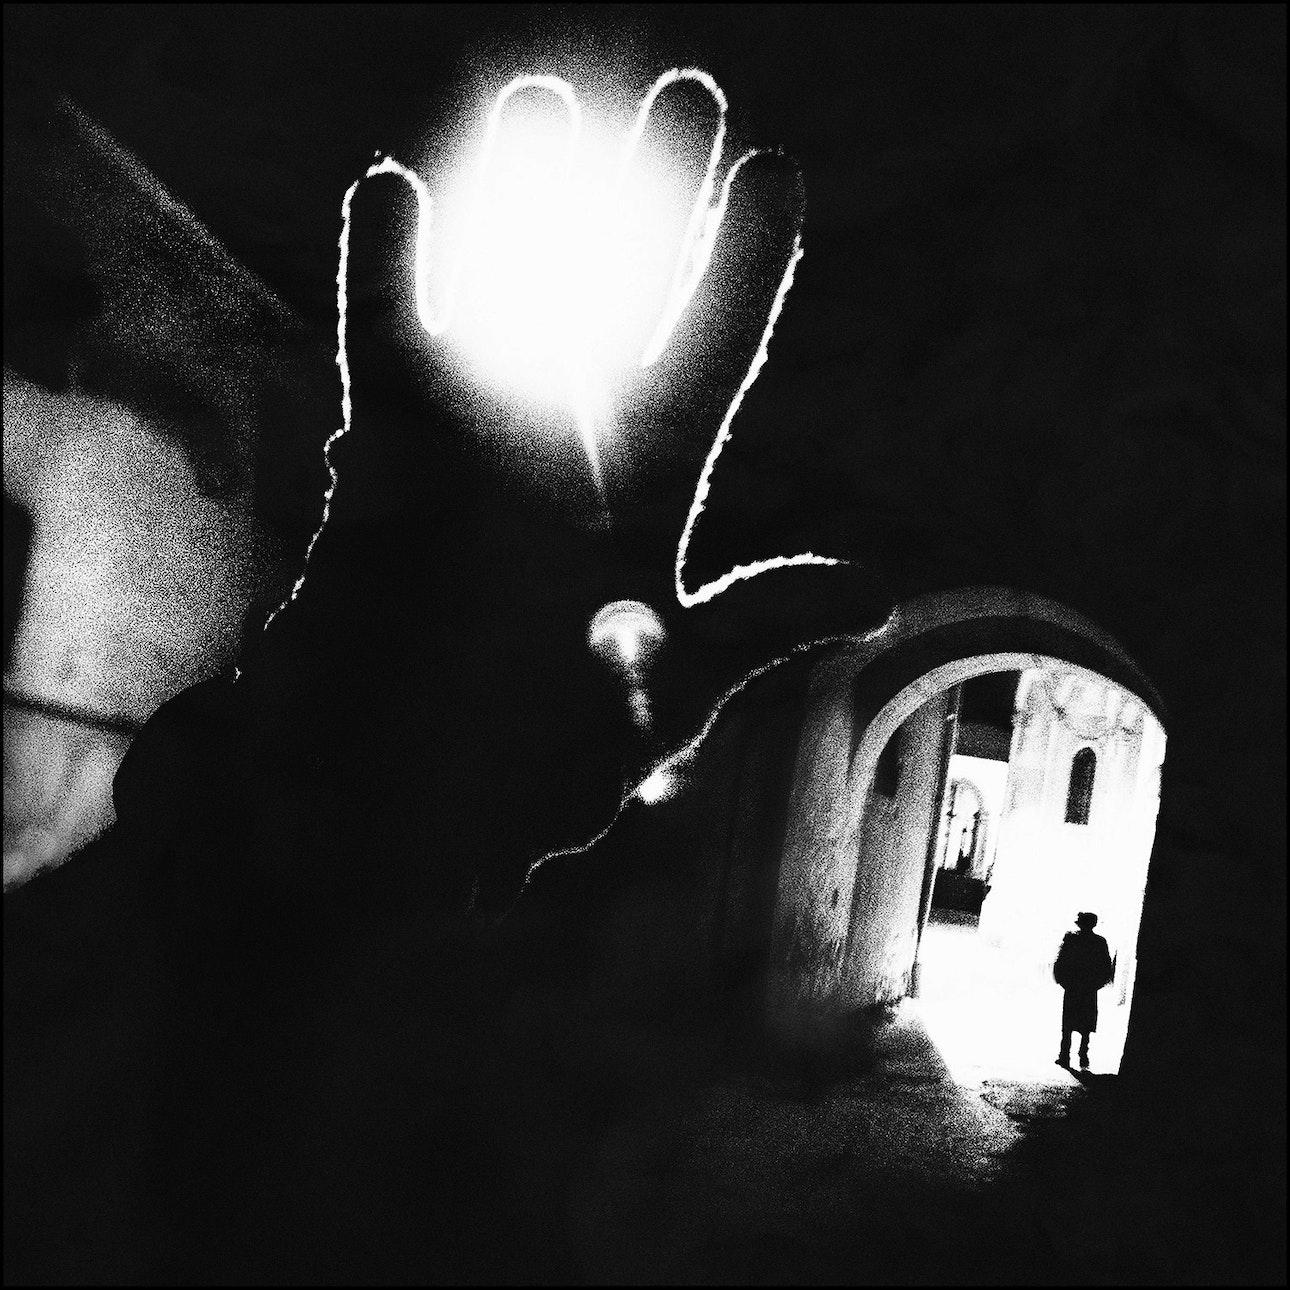 Bychko_series_to_light5-min